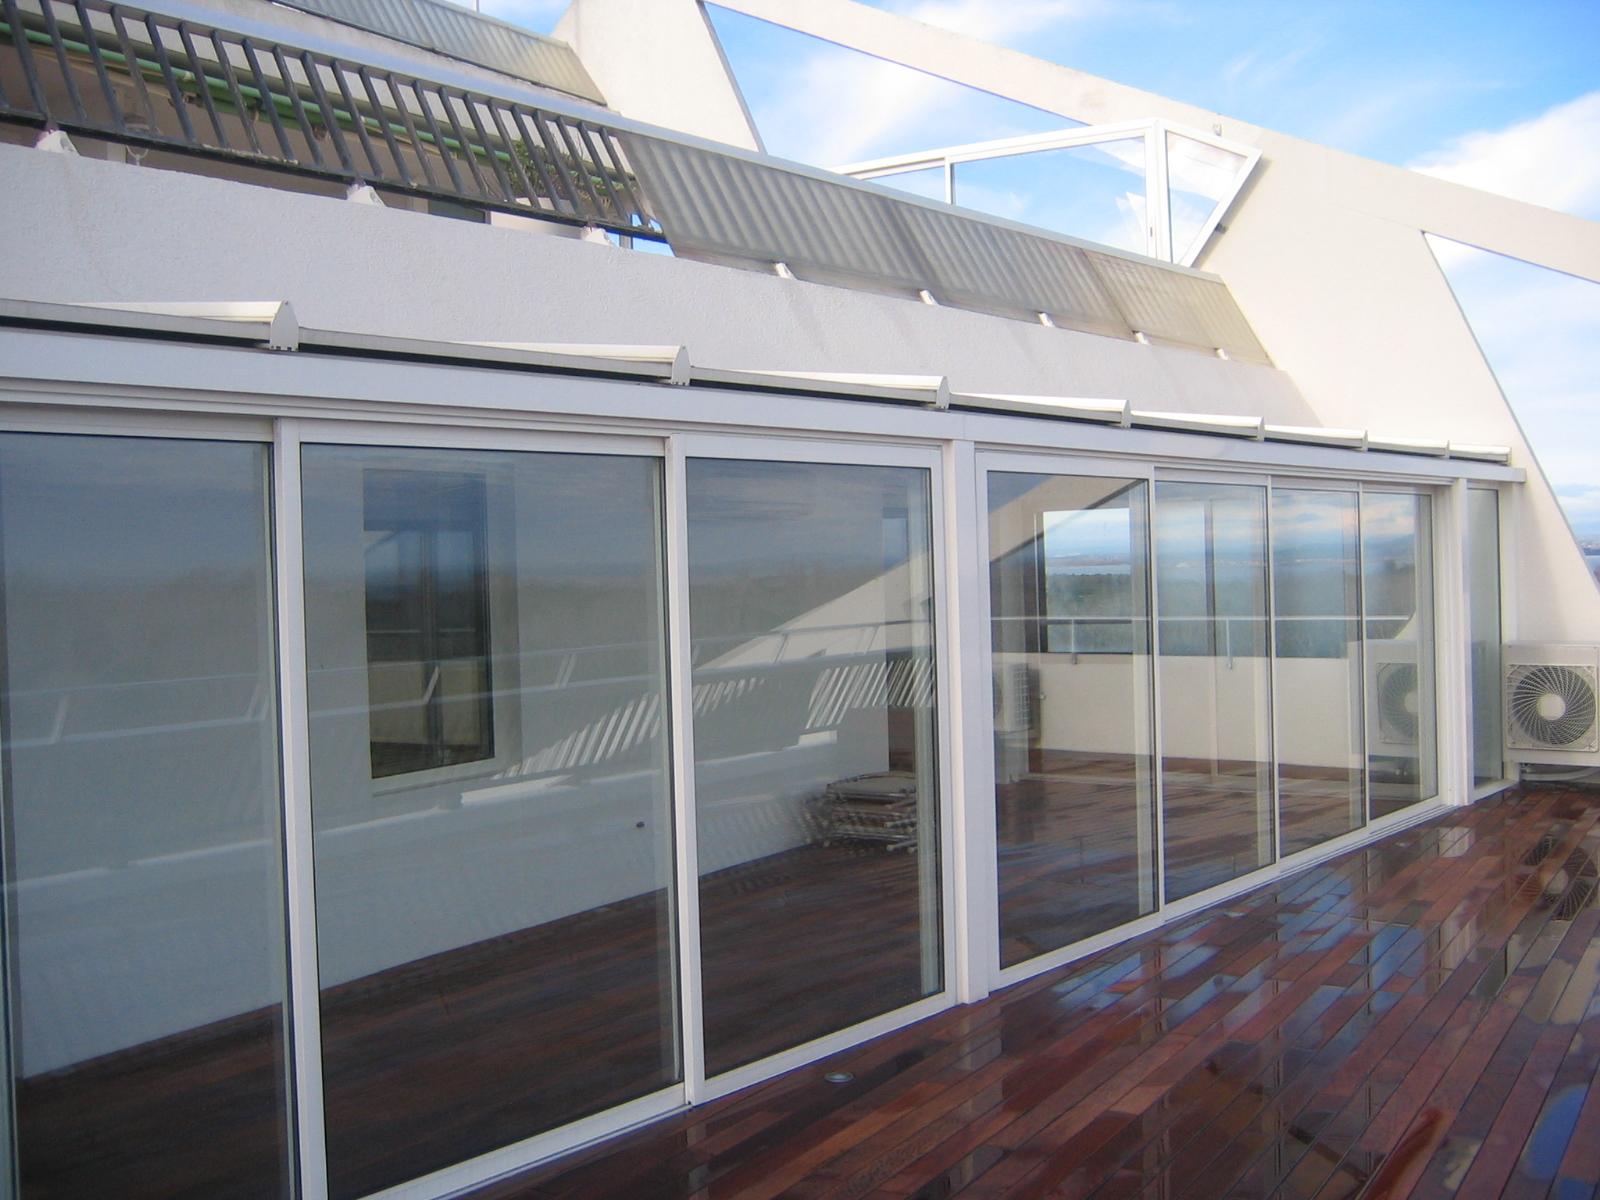 baies en aluminium menuiserie sur mesure dans le gard. Black Bedroom Furniture Sets. Home Design Ideas